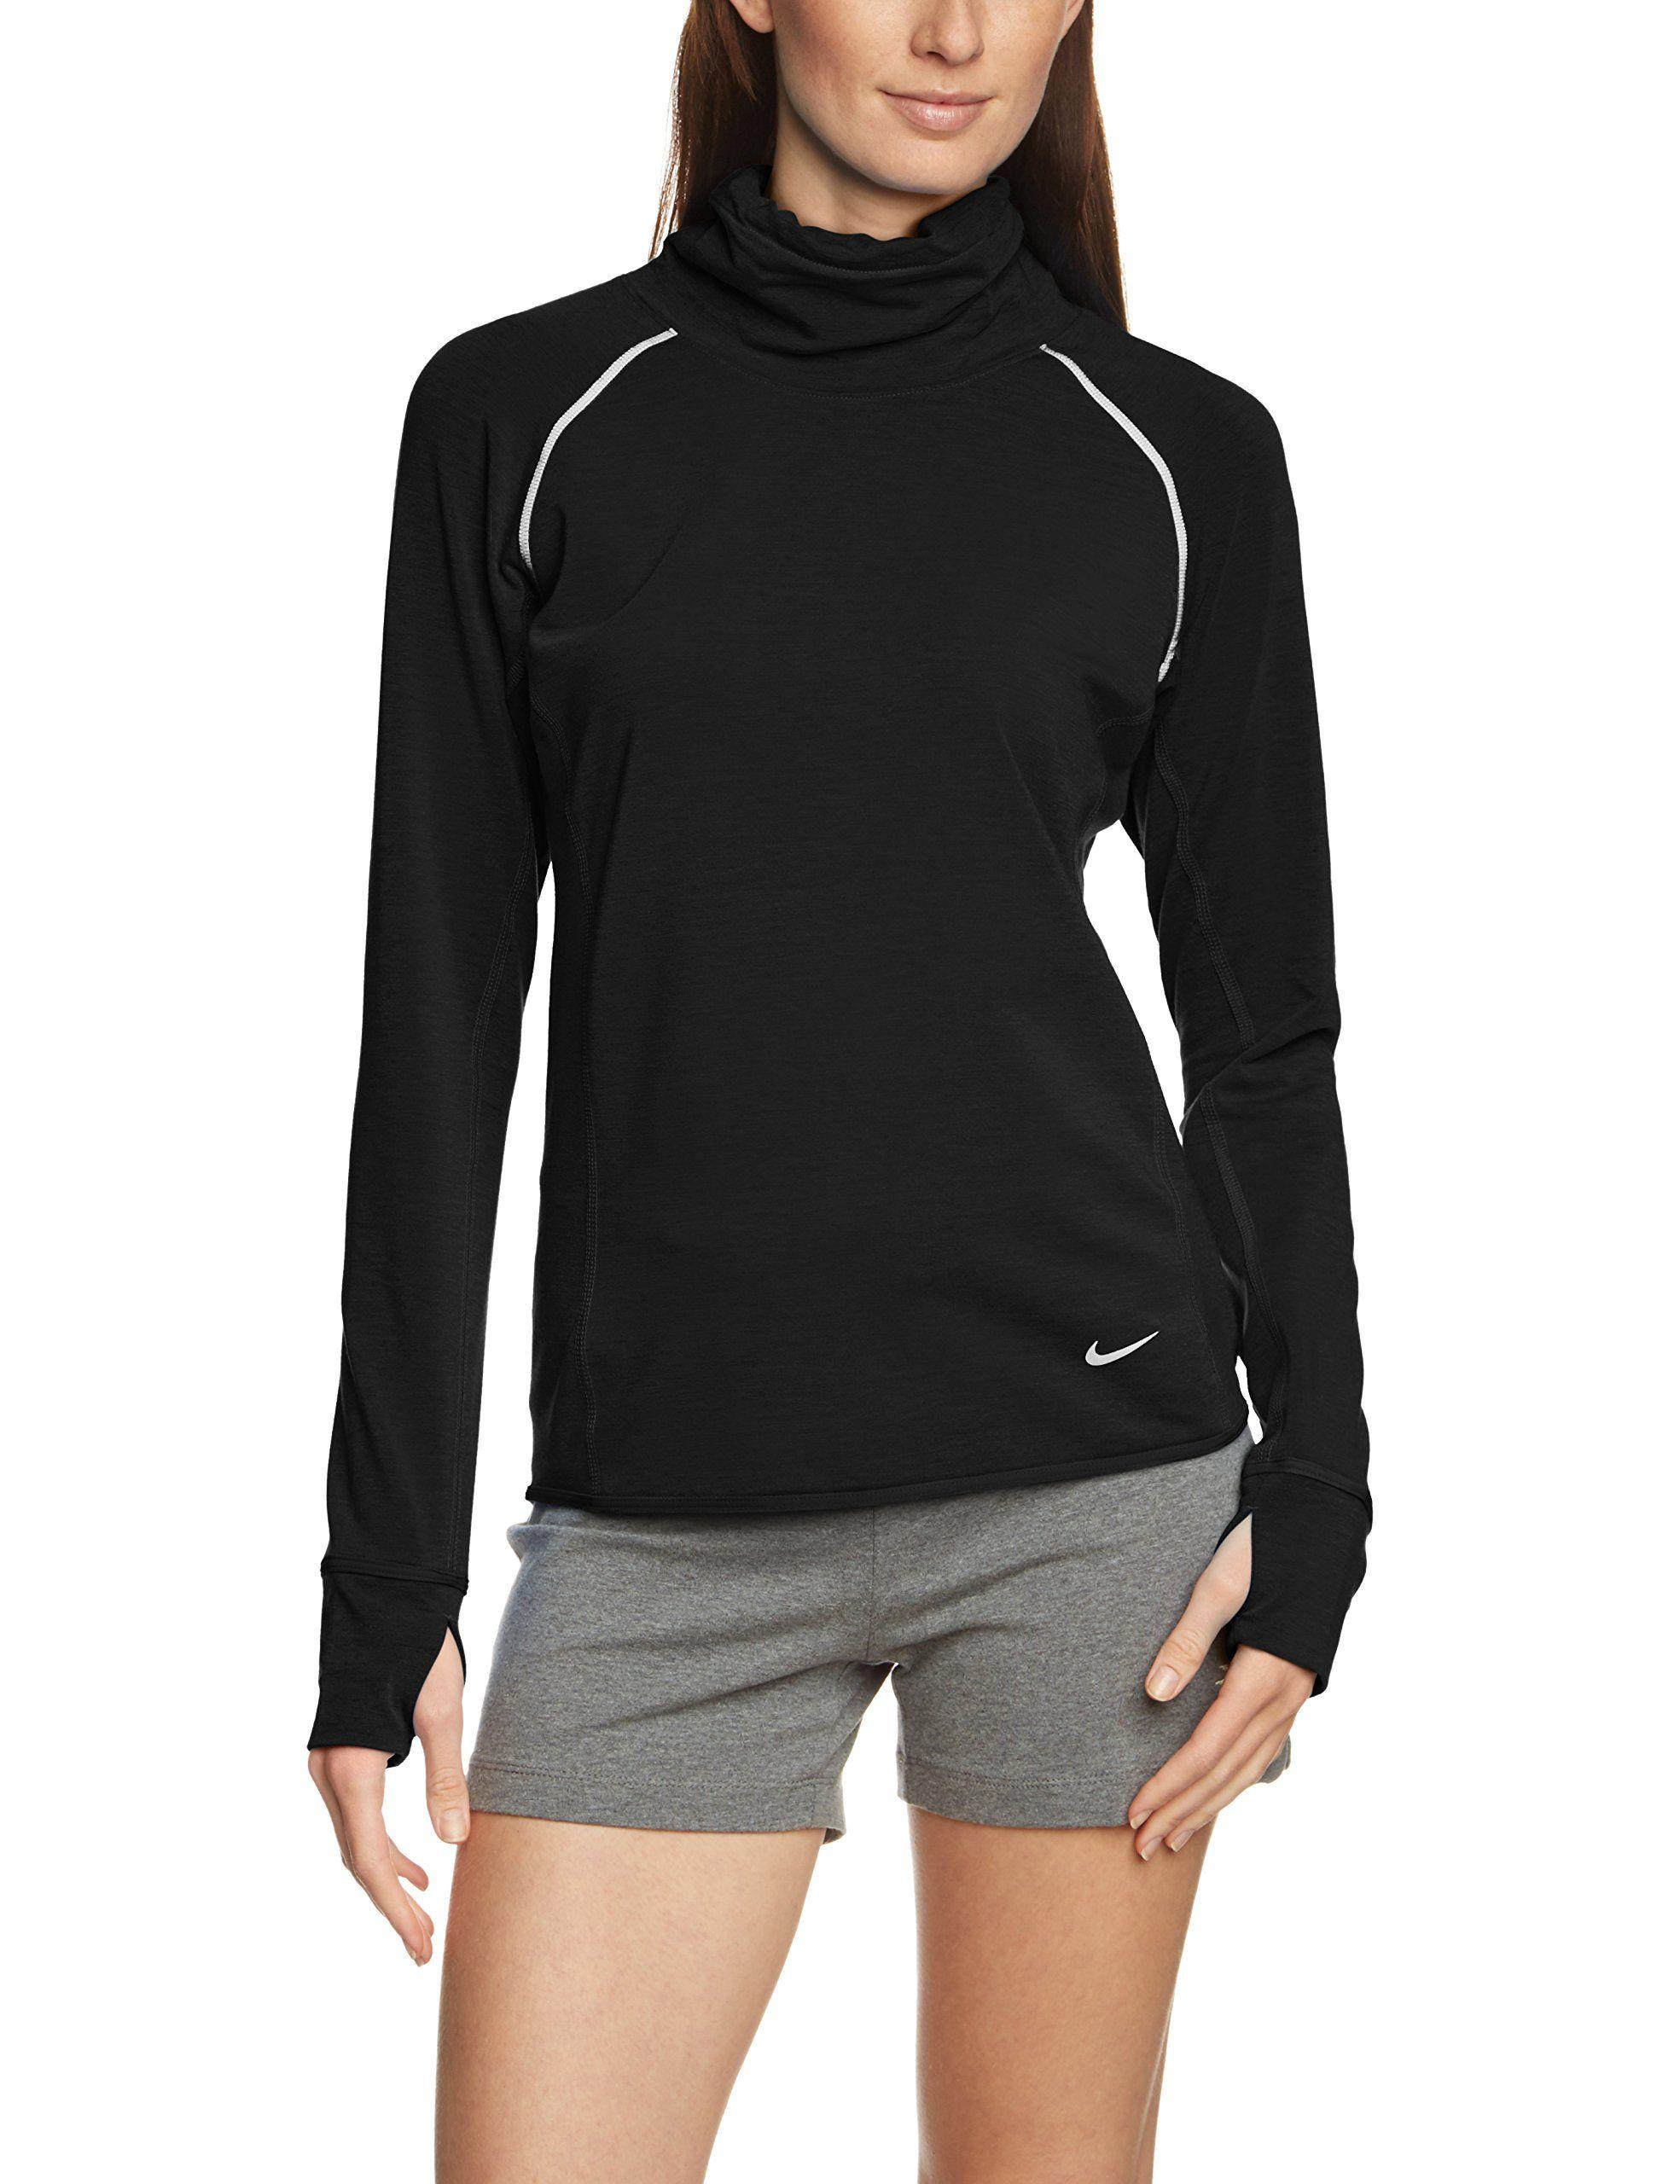 db6d4dd229ed Nike Women s Dri-FIT Sprint Fleece Pullover Running Top